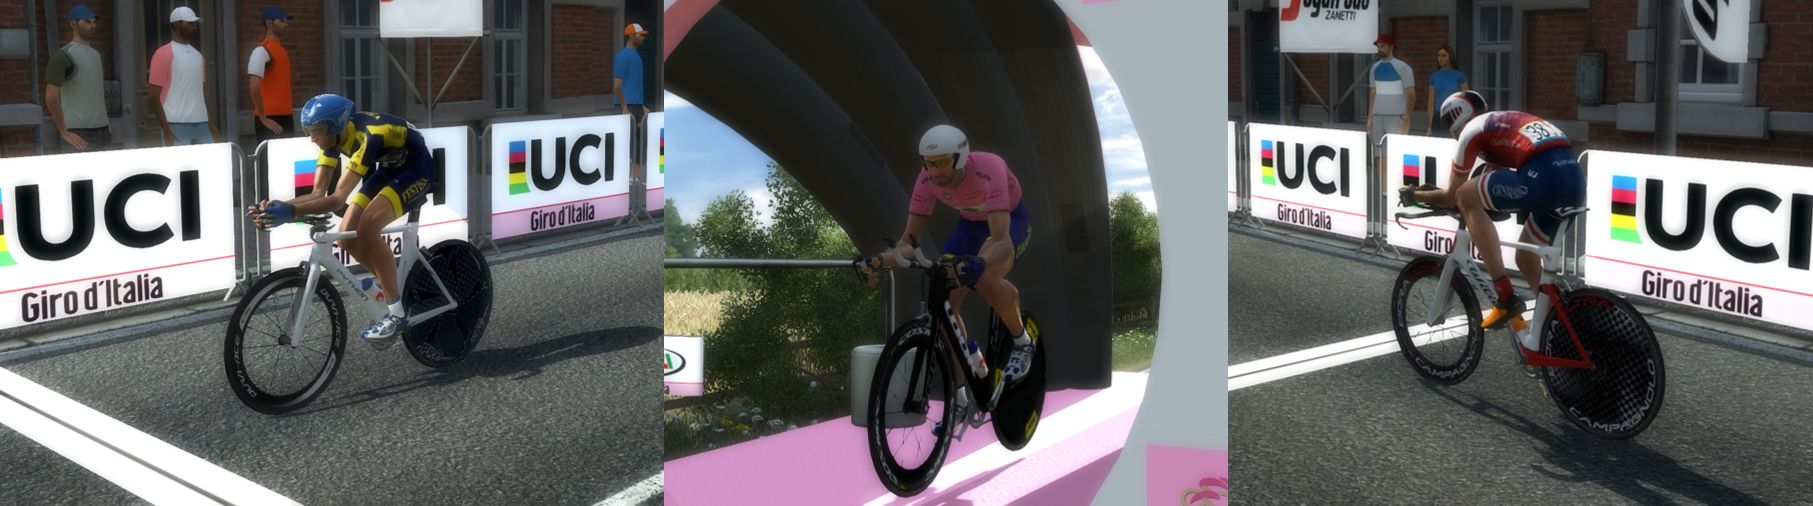 pcmdaily.com/images/mg/2020/Reports/GTM/Giro/S14/mg20_giro_s14_66.jpg